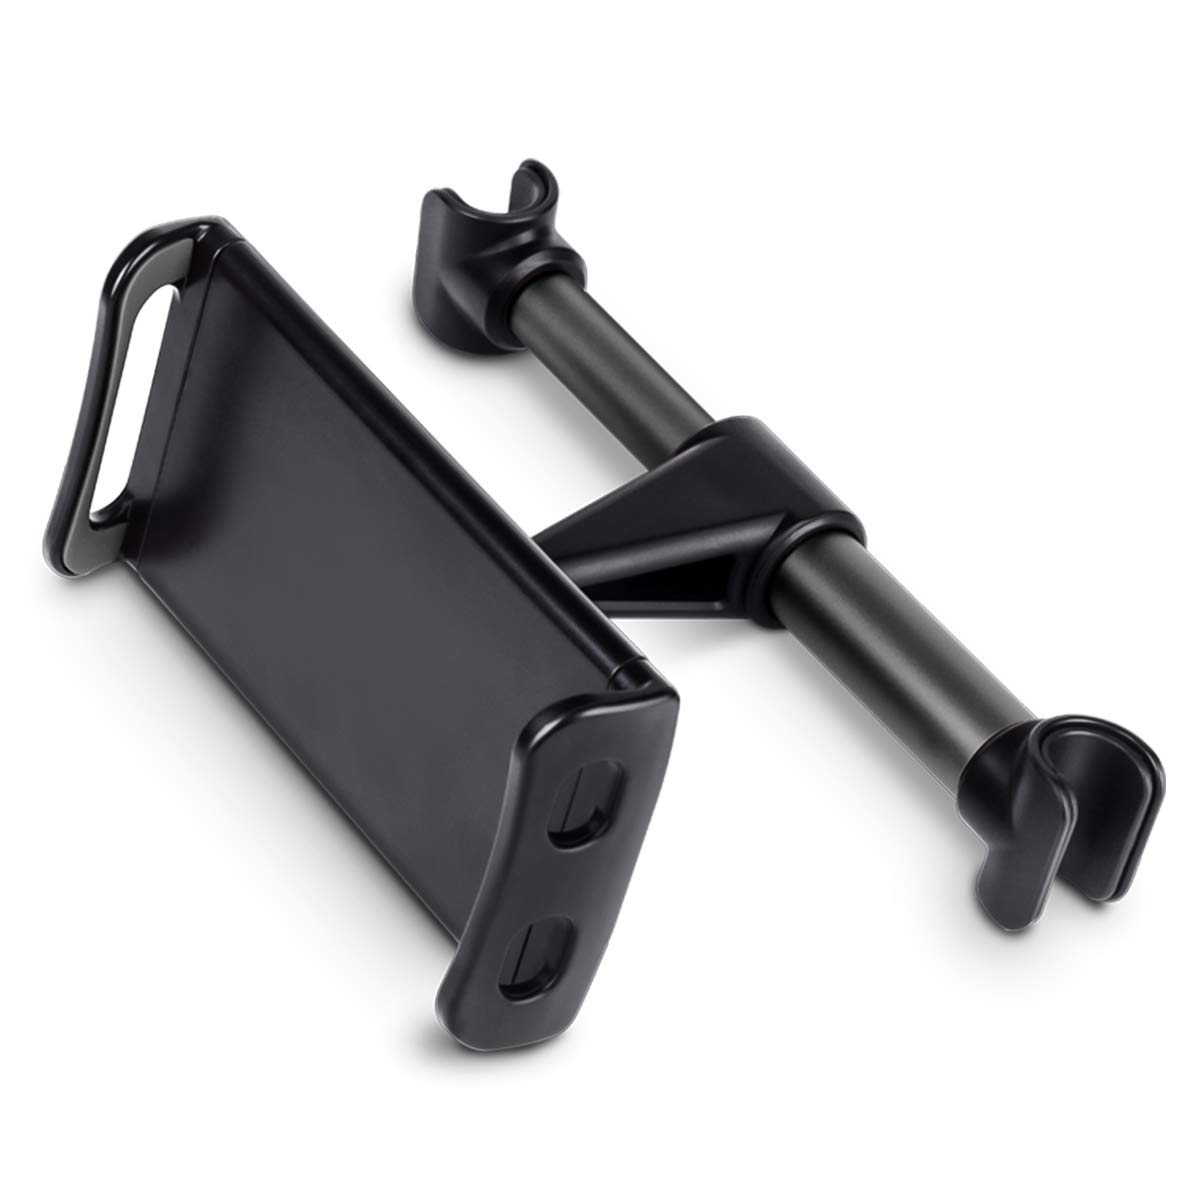 PEYOU Tablet Halterung Auto Kopfstü tze Kompatibel mit iPhone iPad/Samsung Tabs/ Kindle Fire HD, Passend fü r Alle 4-10.5 Zoll Smartphones und Tablets Peyou113-0067-01